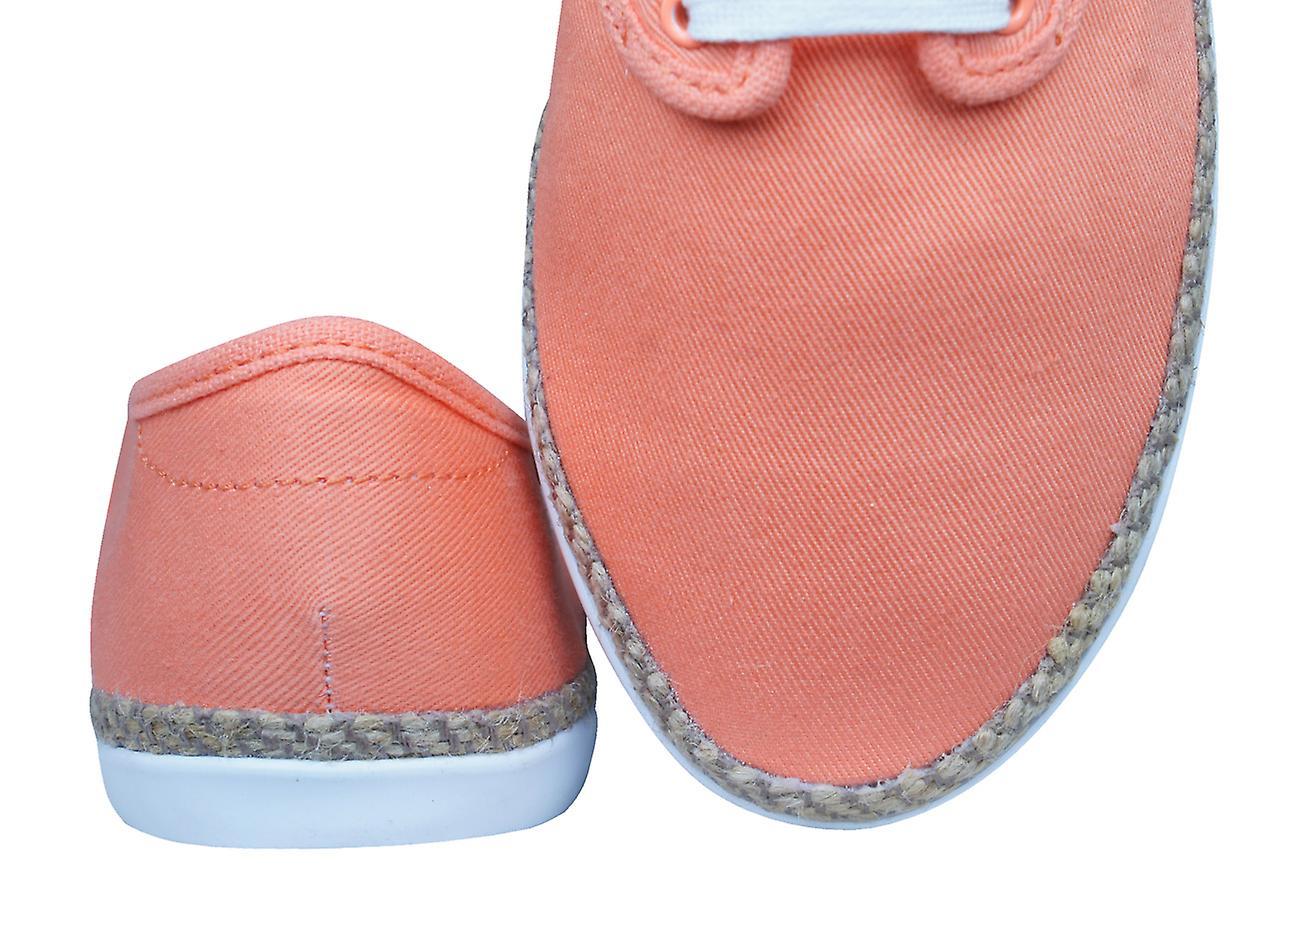 adidas Originals Adria PS Espadrile Womens Trainers Shoes Orange